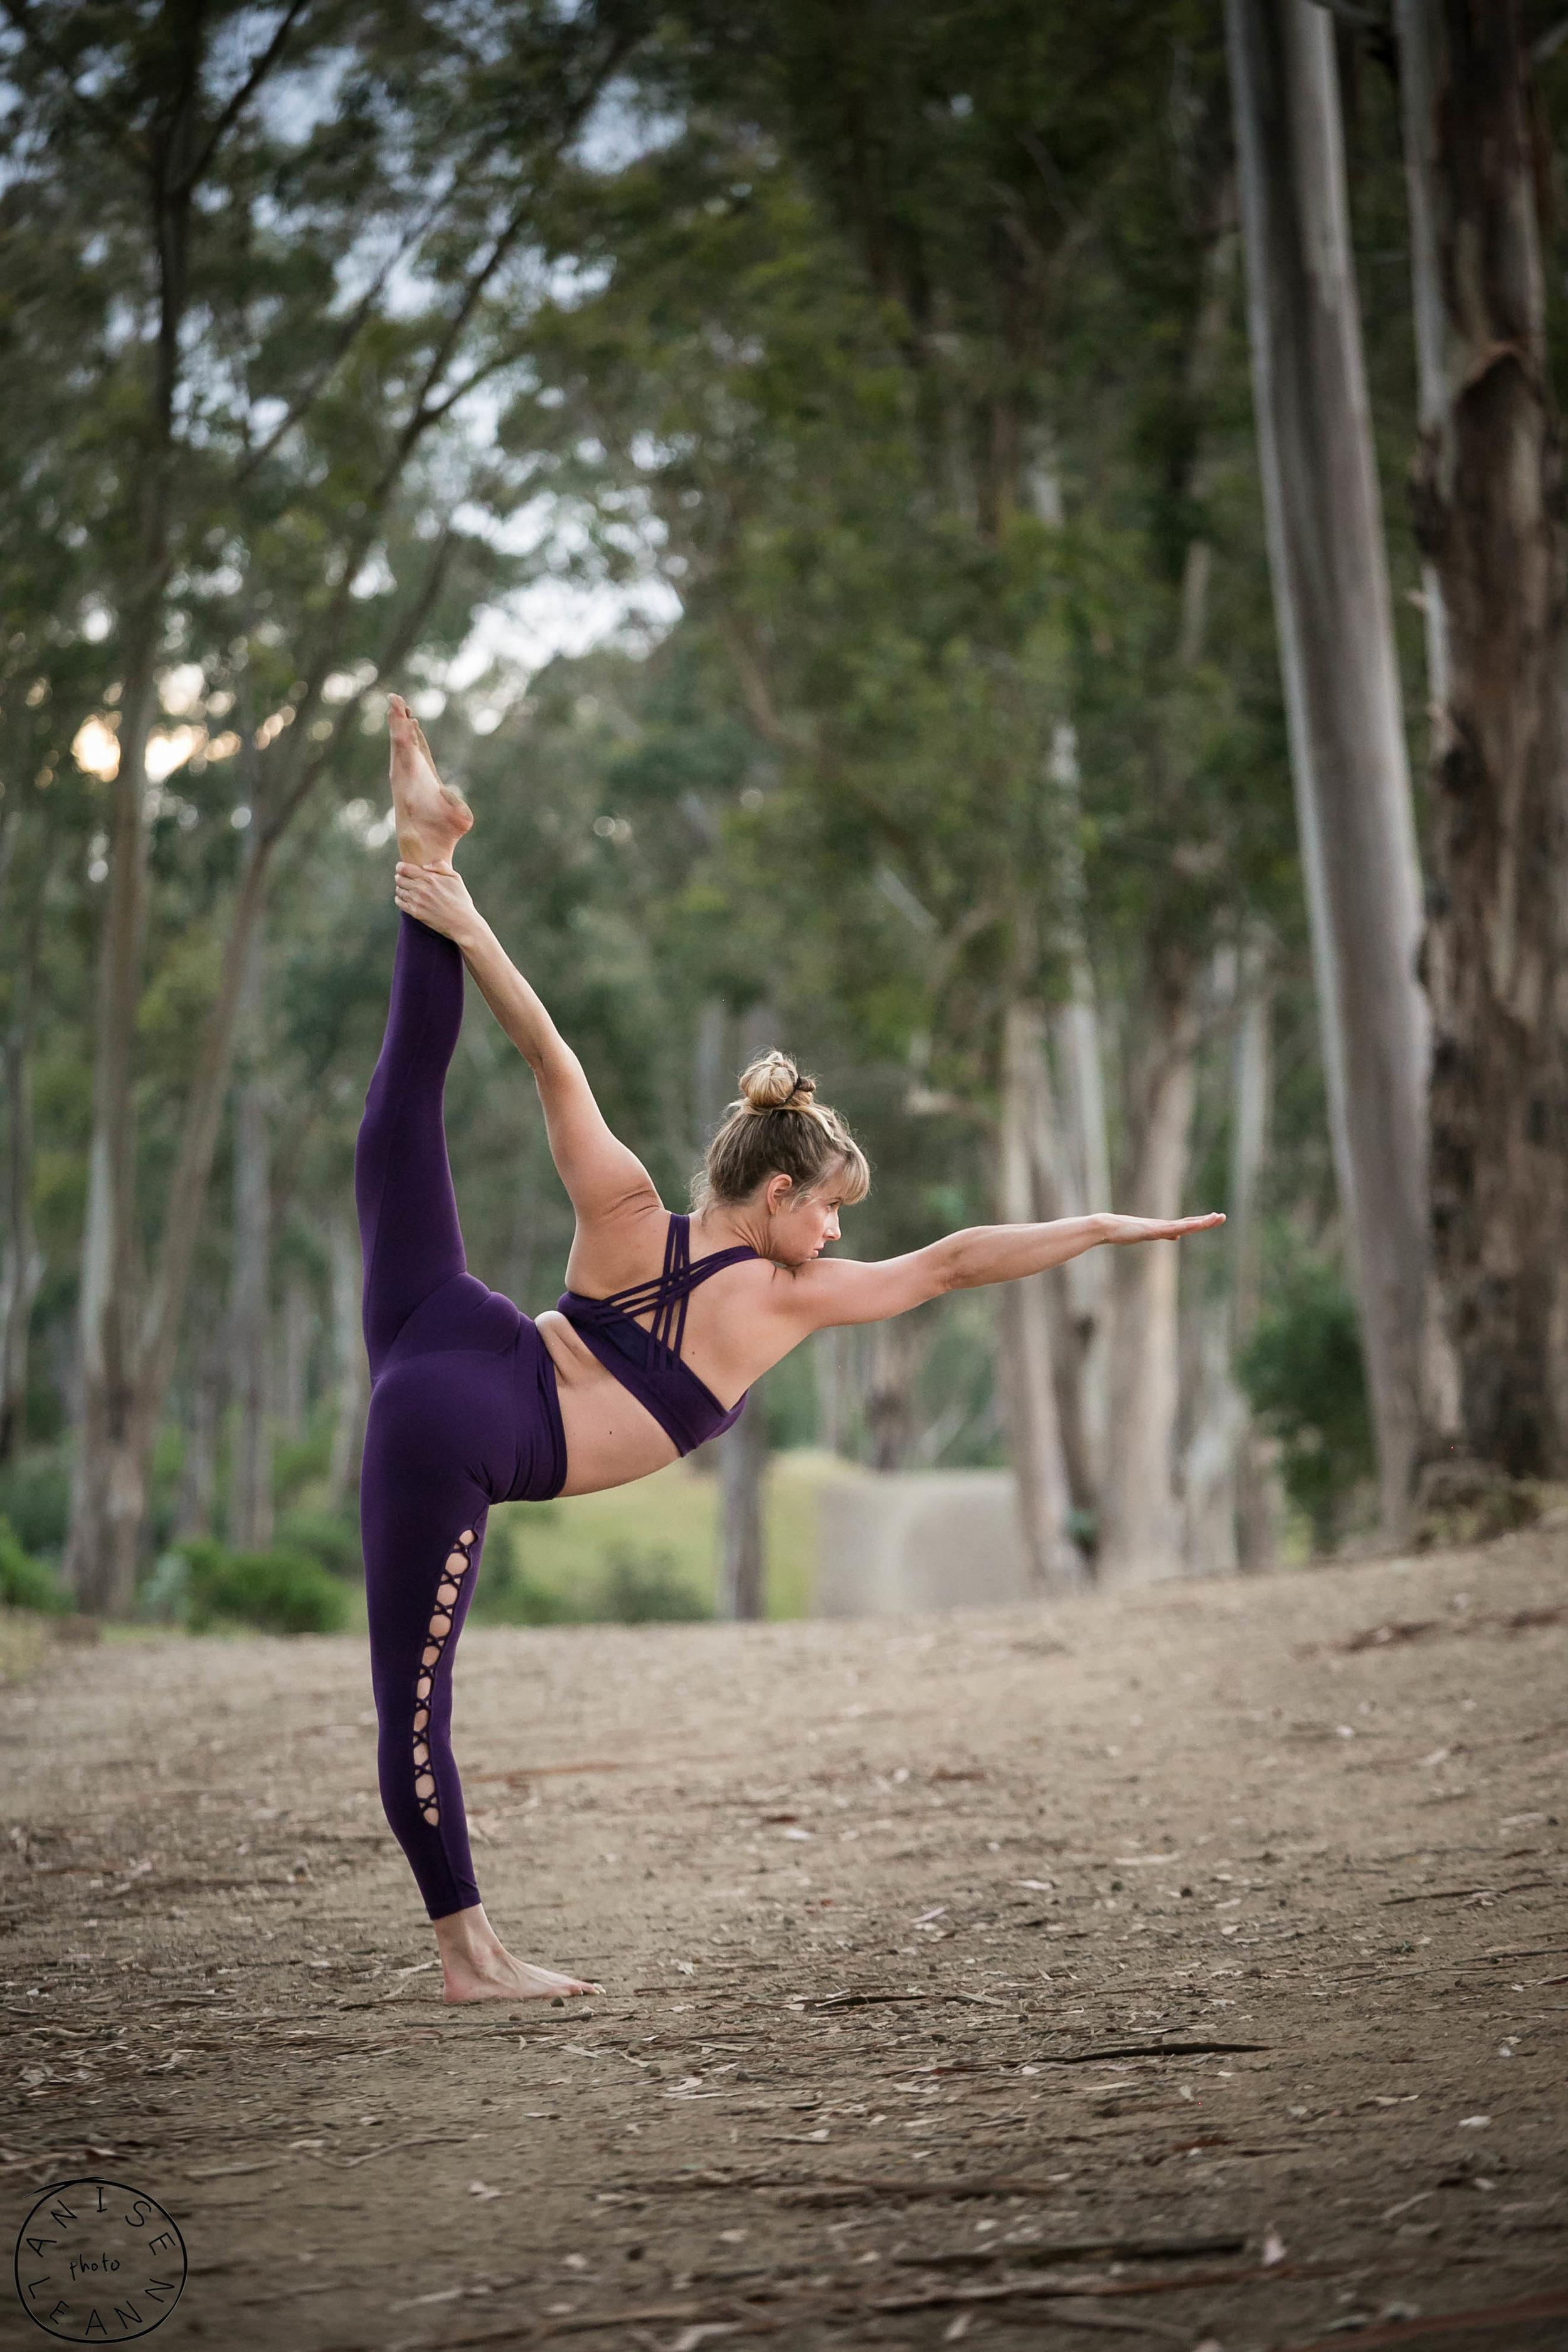 erika yoga -58.jpg